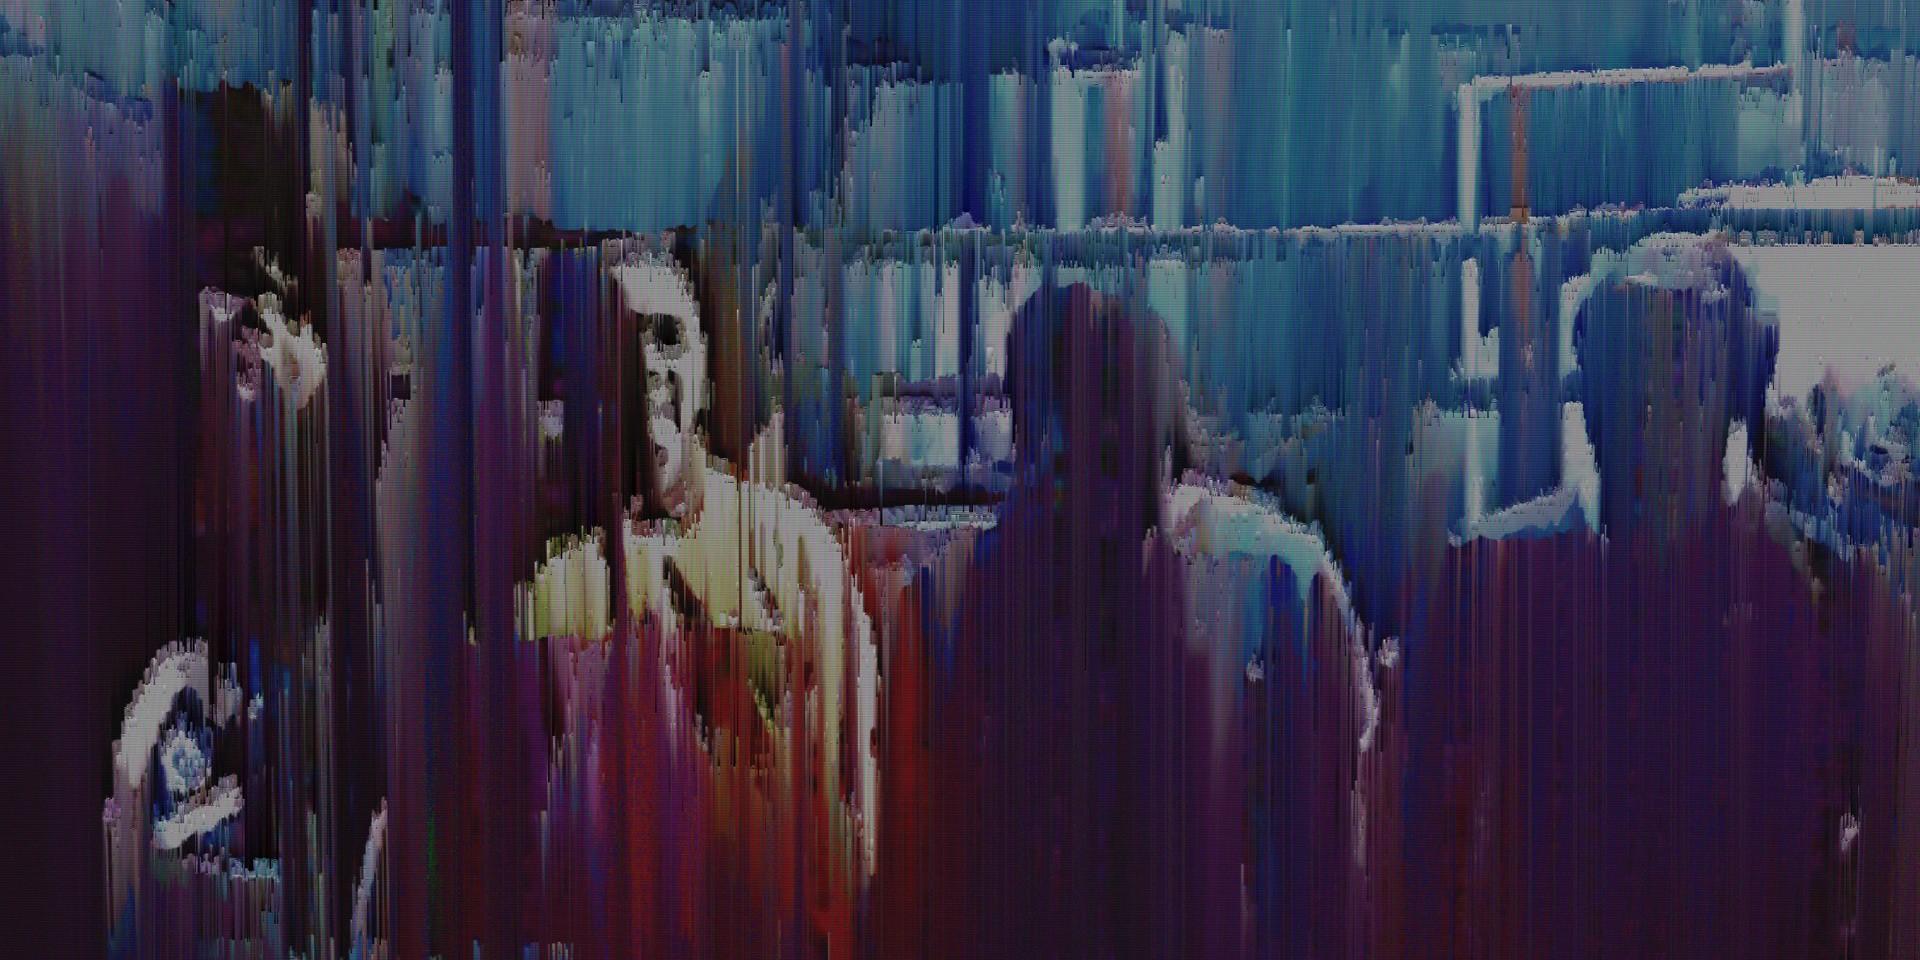 Sound Architects reveal Regenesis tracklist ahead of album release